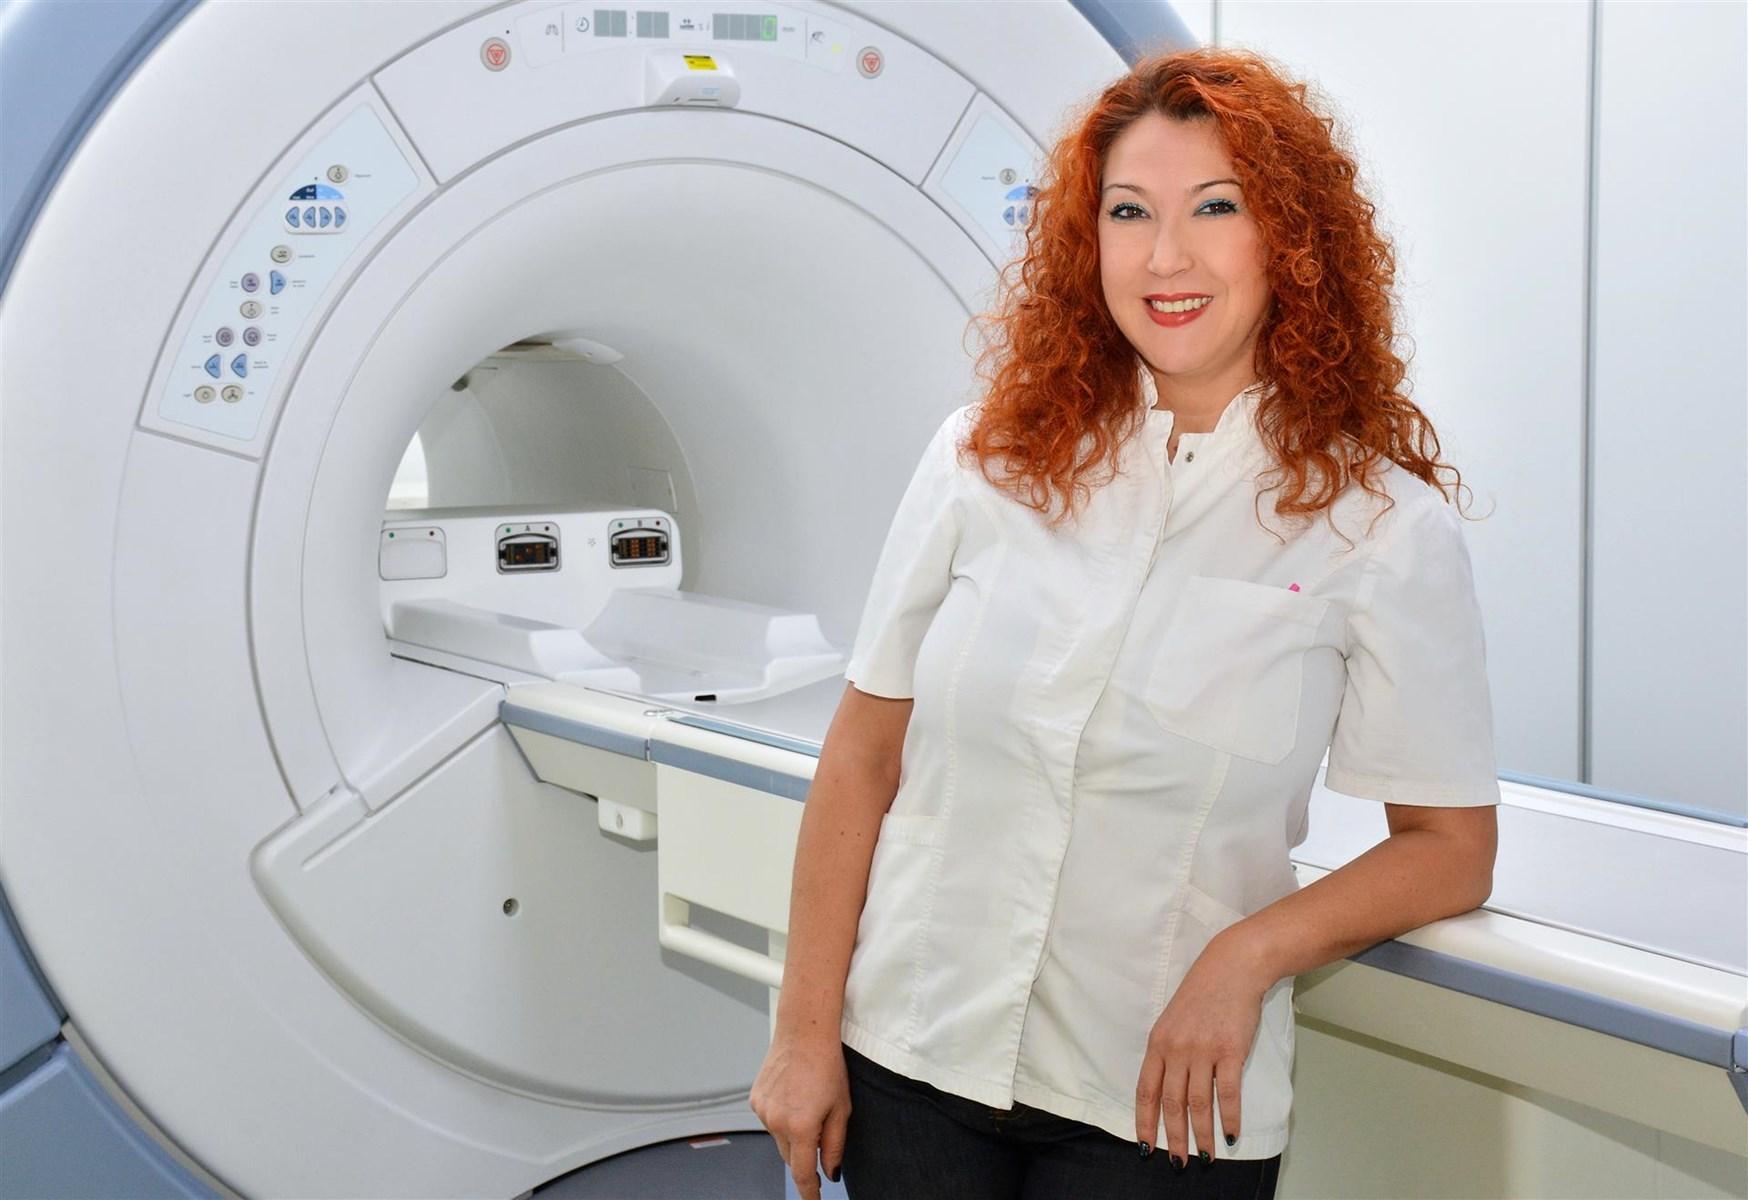 Ass.Dr. Biljana Bozinovska - Specialized Radiologist